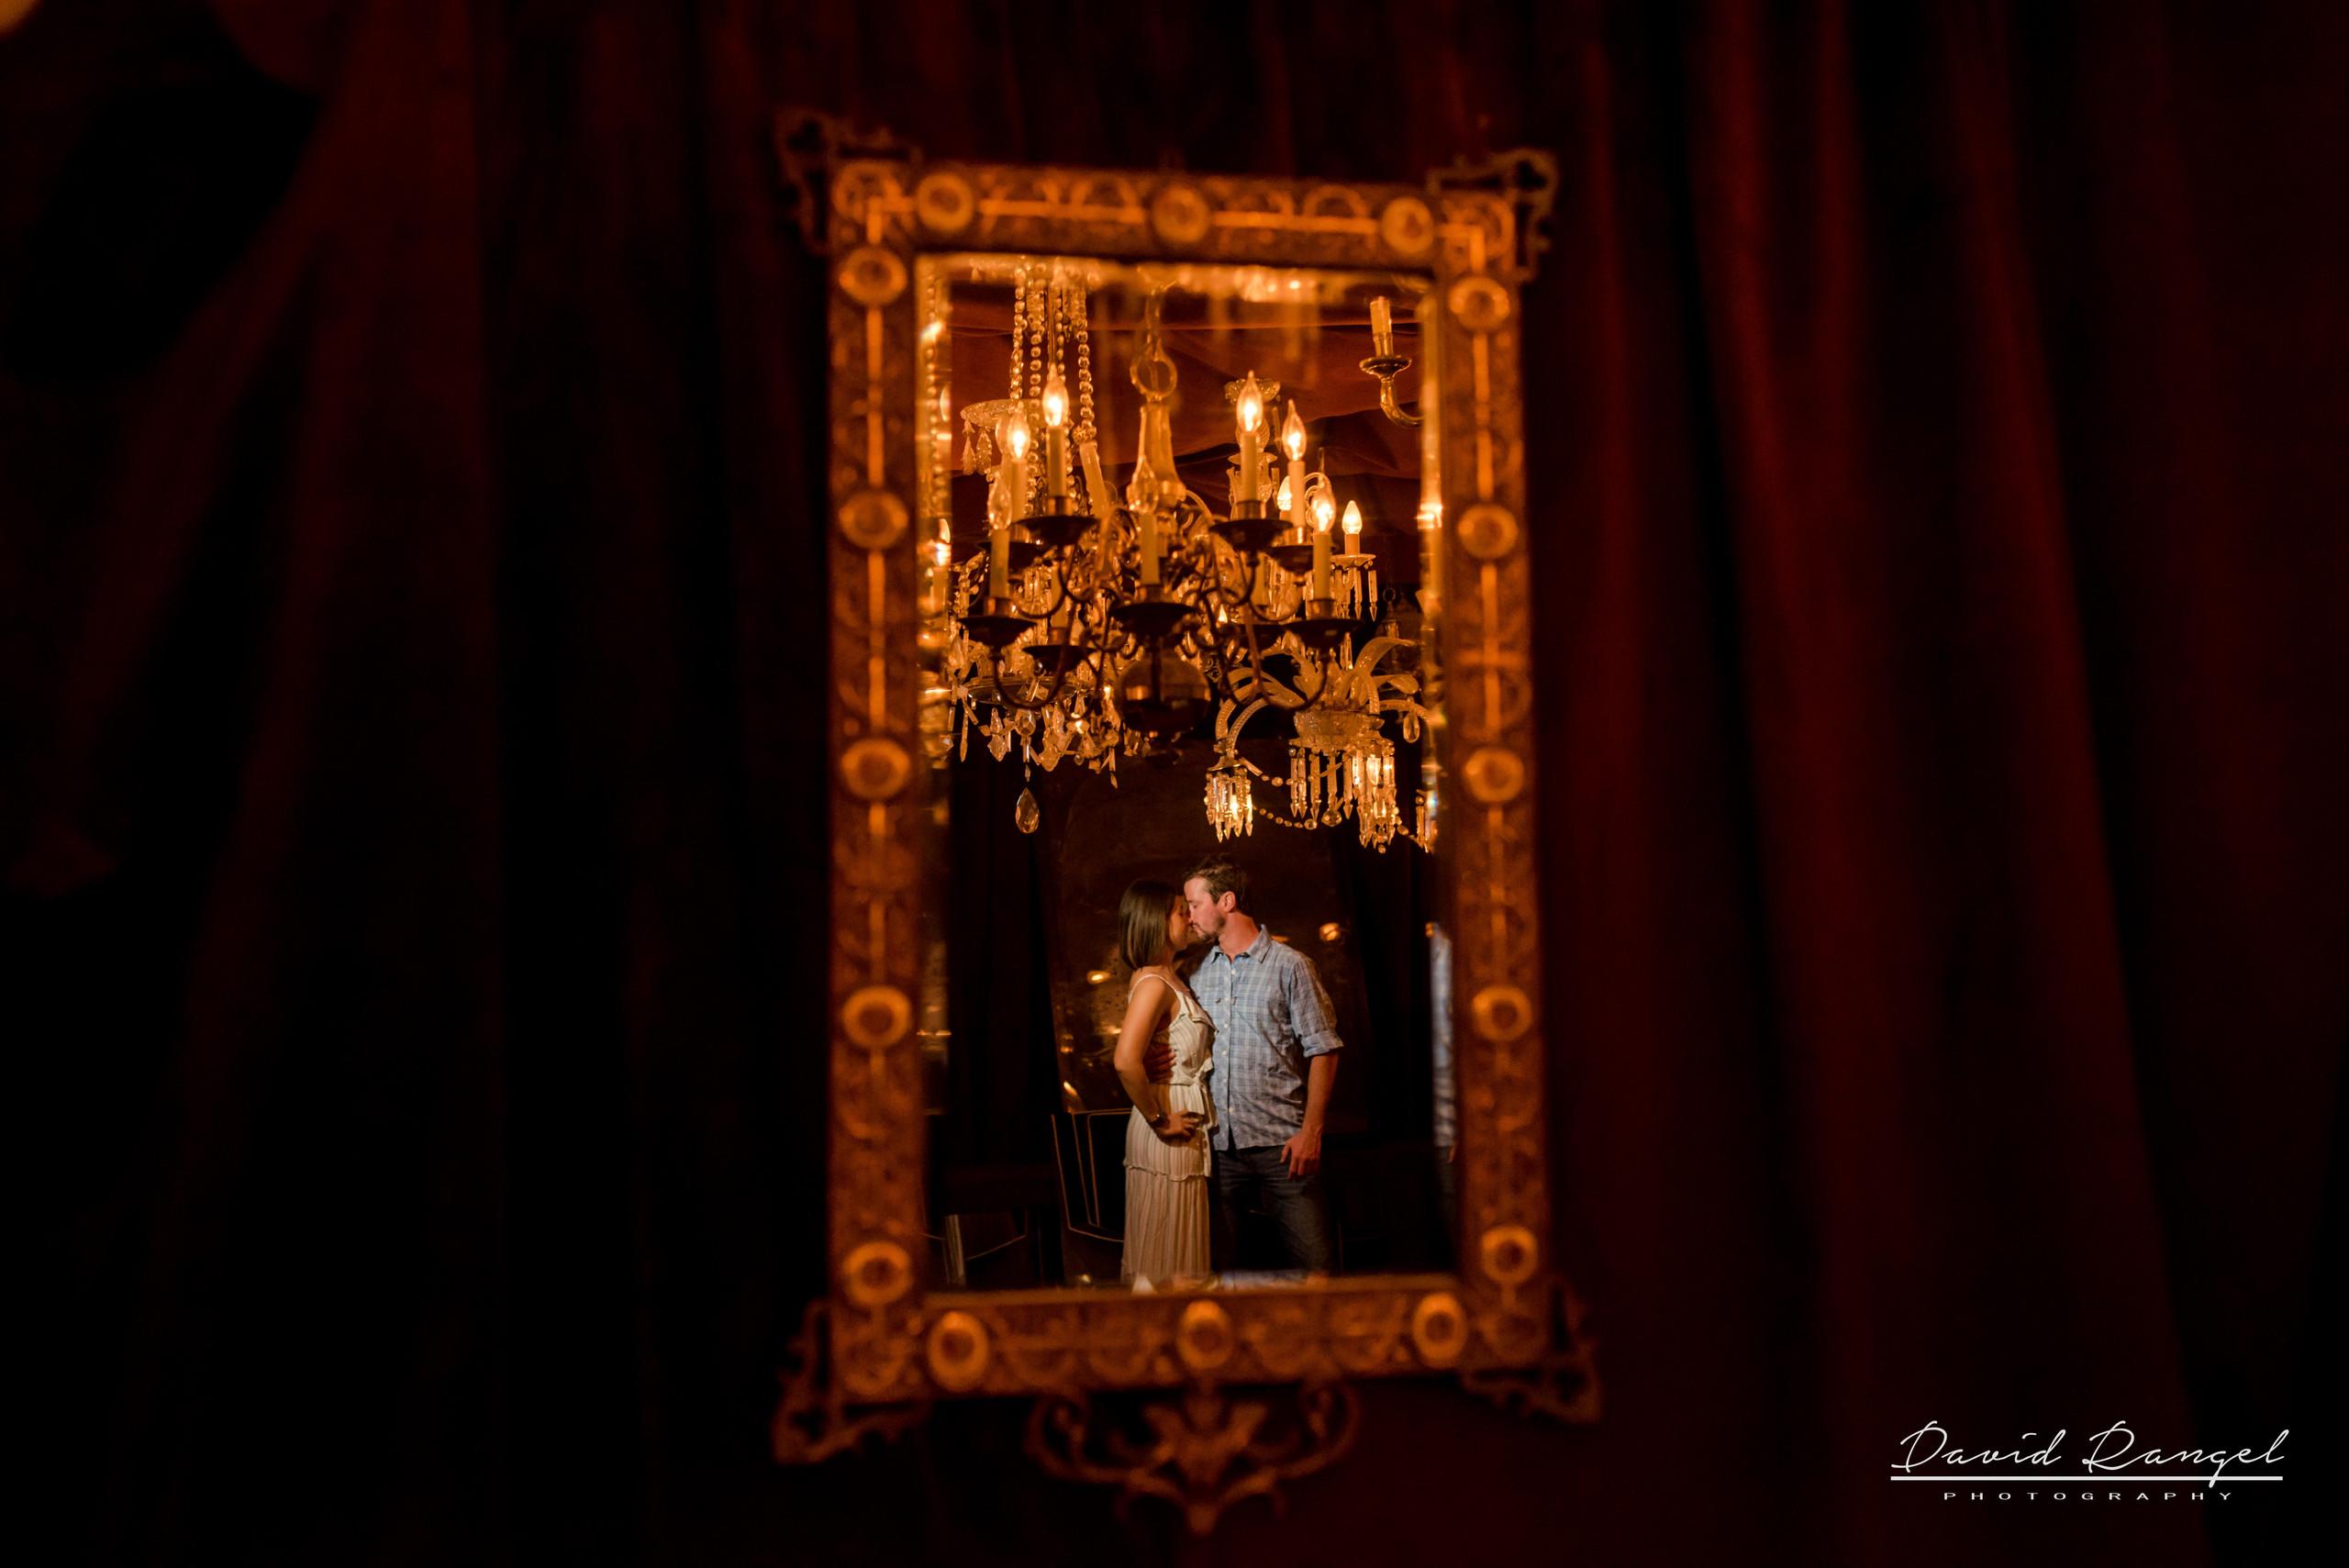 engagement+session+ring+sorprise+beach+vacations+casa+malca+hotel+pedida+de+mano+propuesta+de+matrimonio+pareja+amor+photo+boutique+reflection